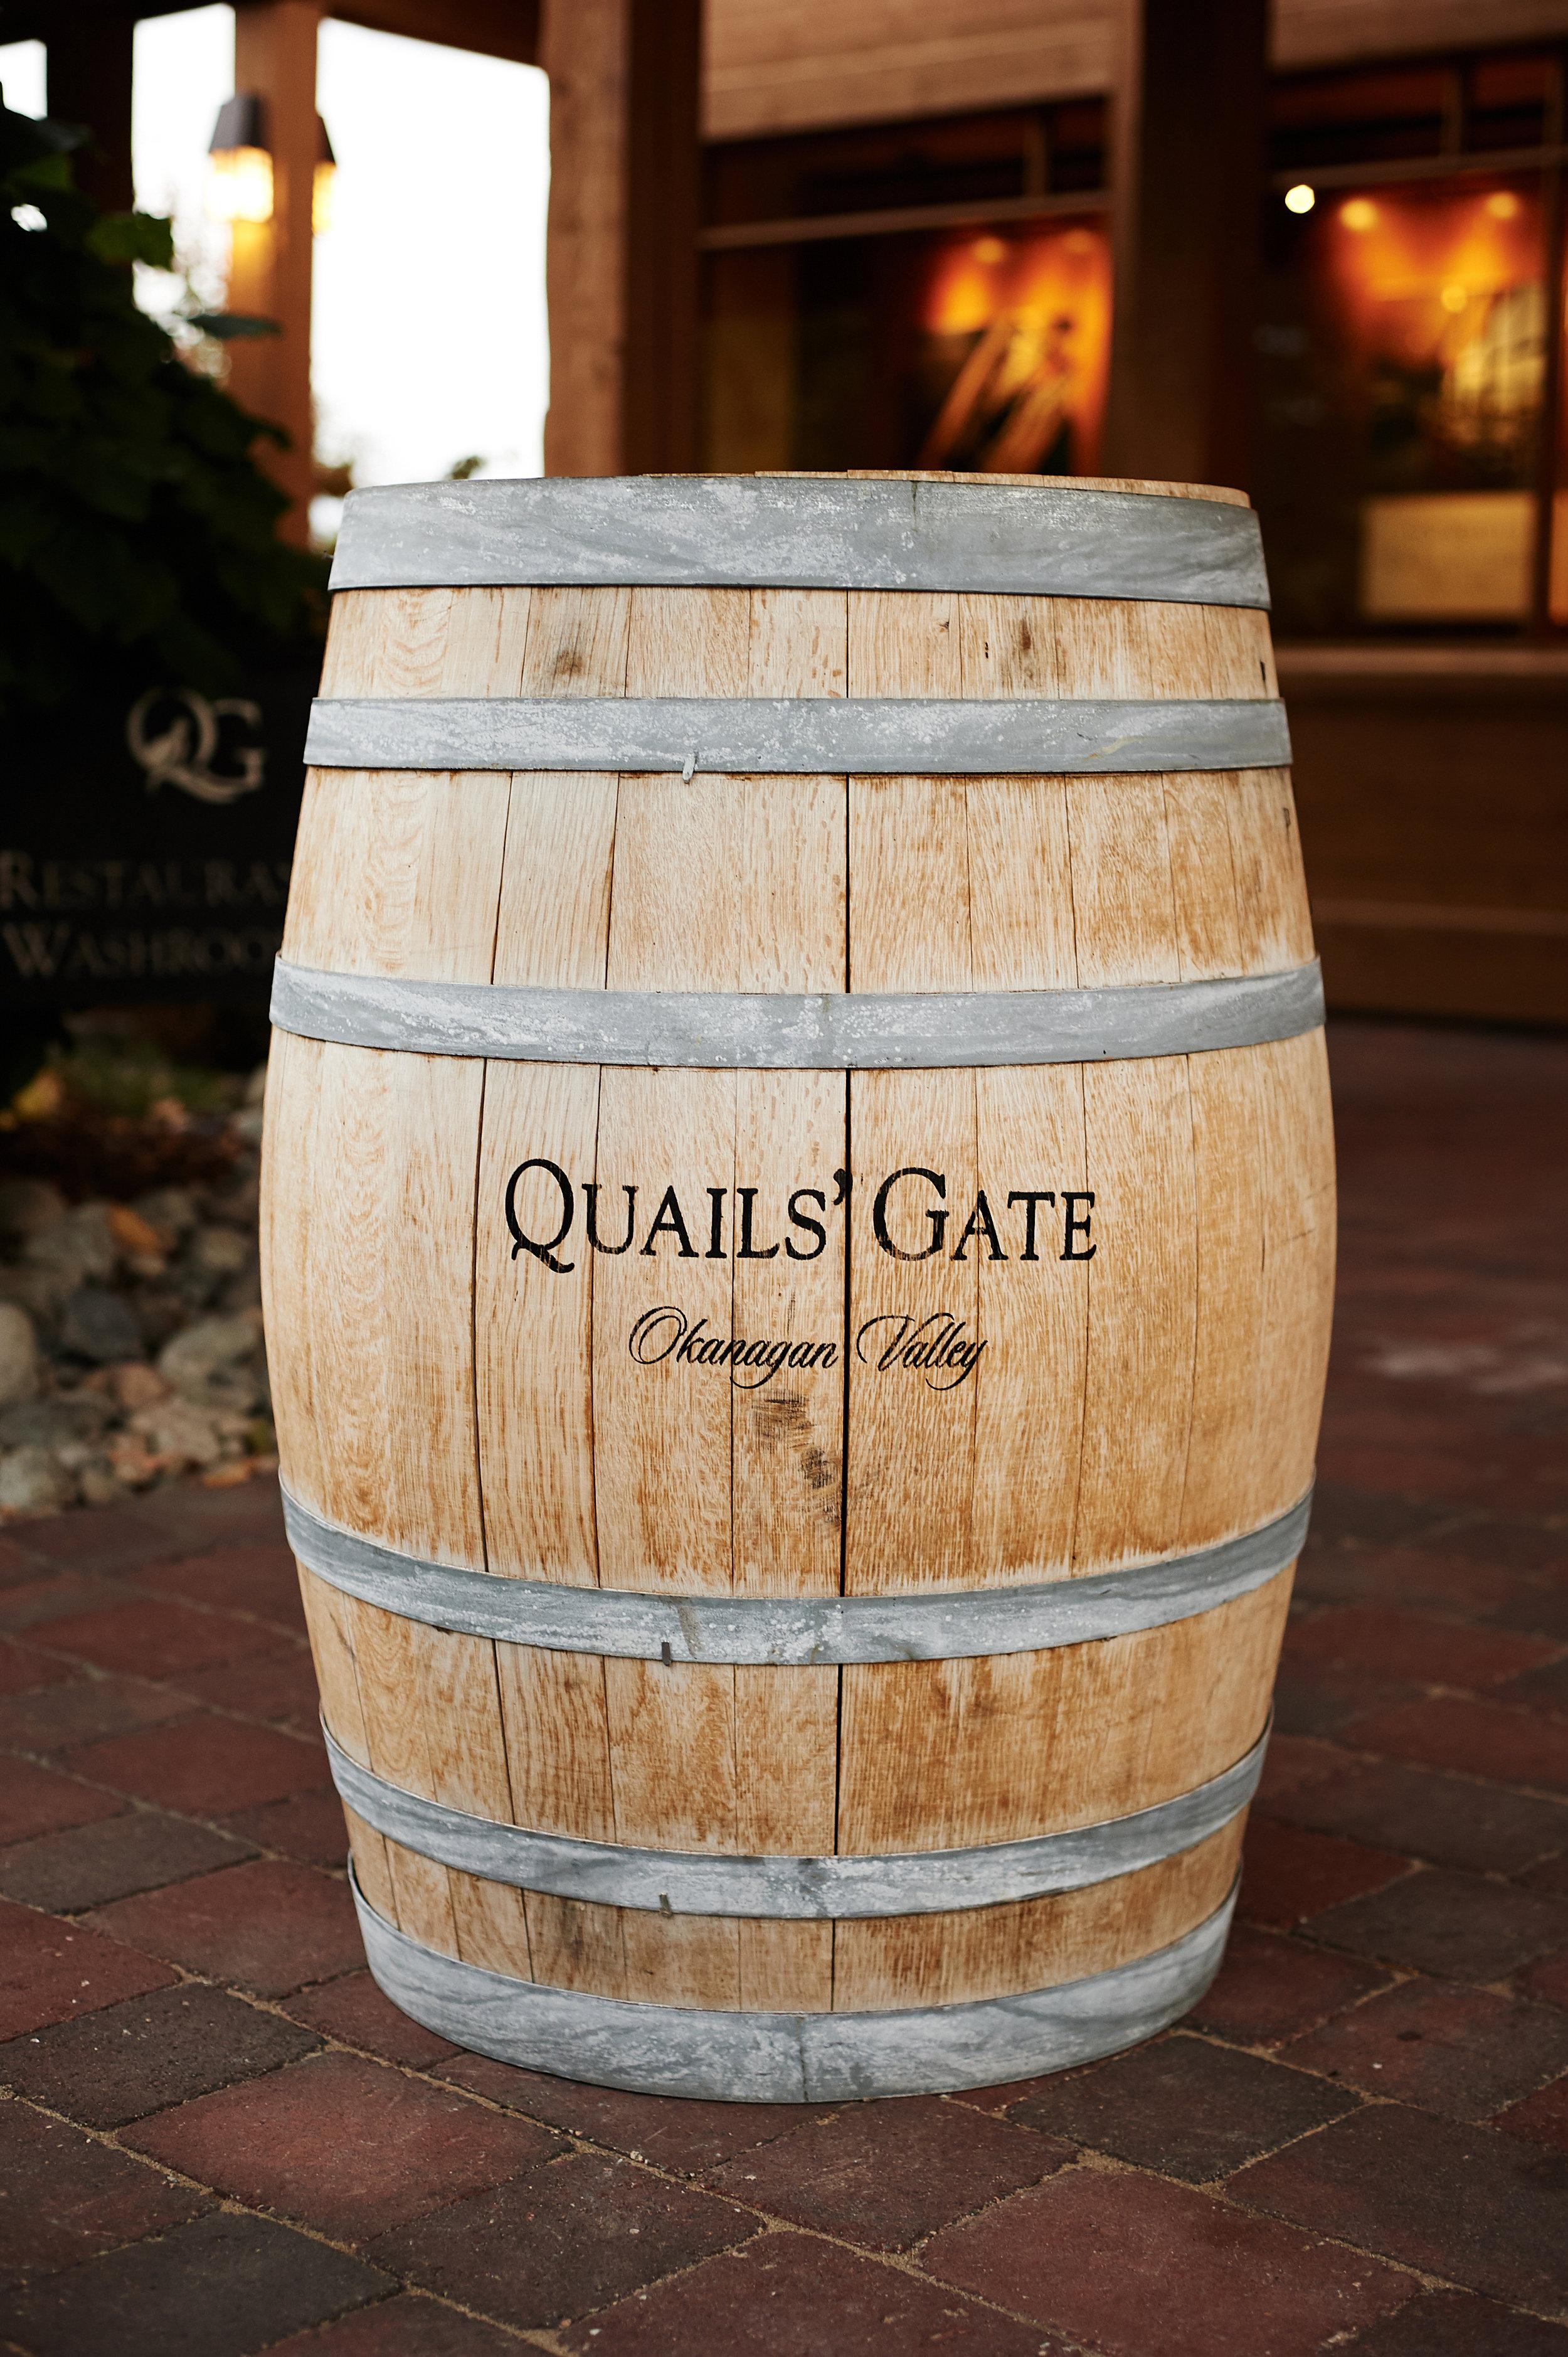 quails gate wine